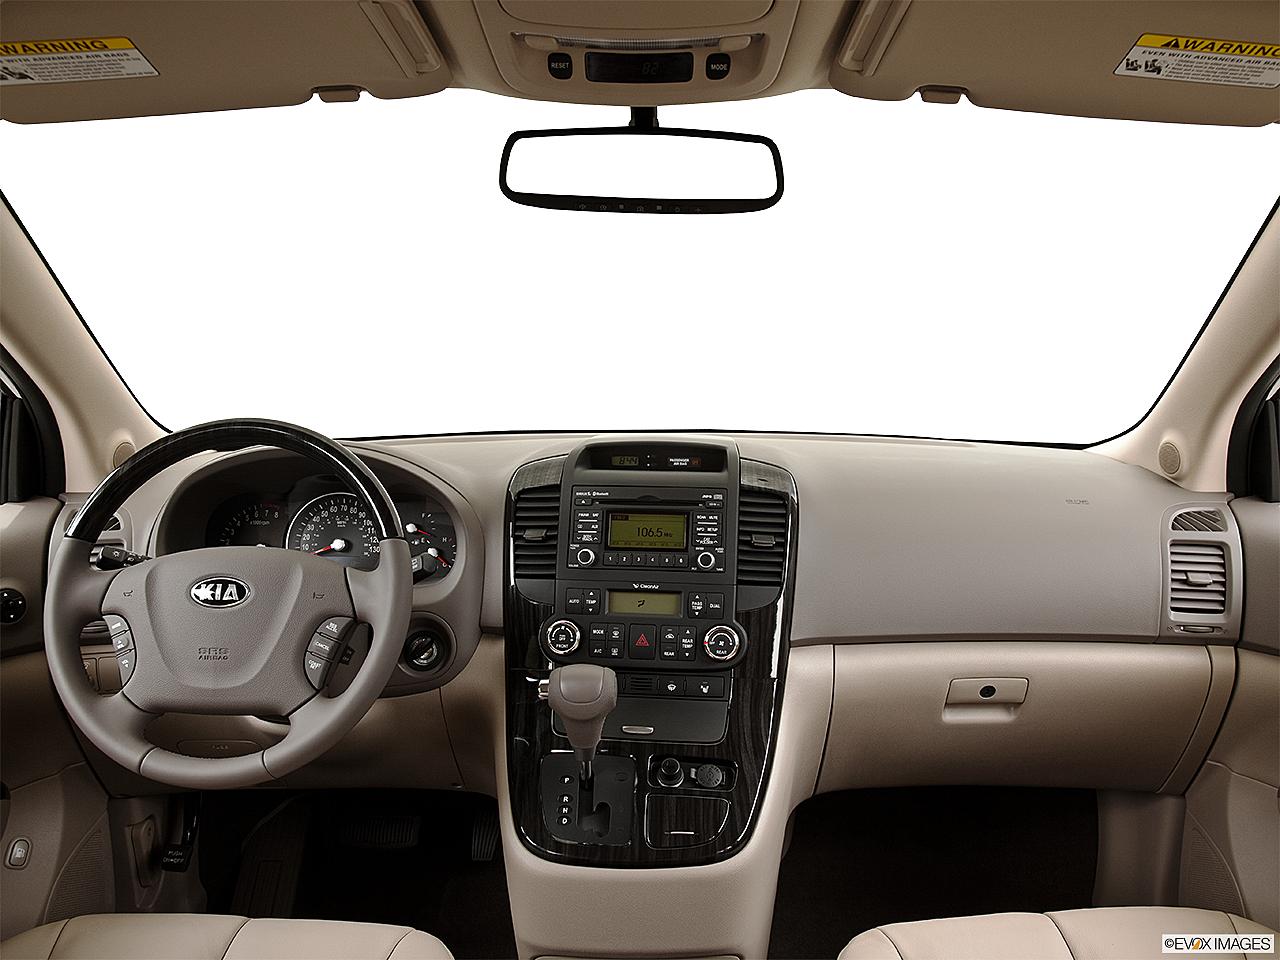 2014 Kia Sedona EX 3.5L V6 6 Spd A/T, Centered Wide